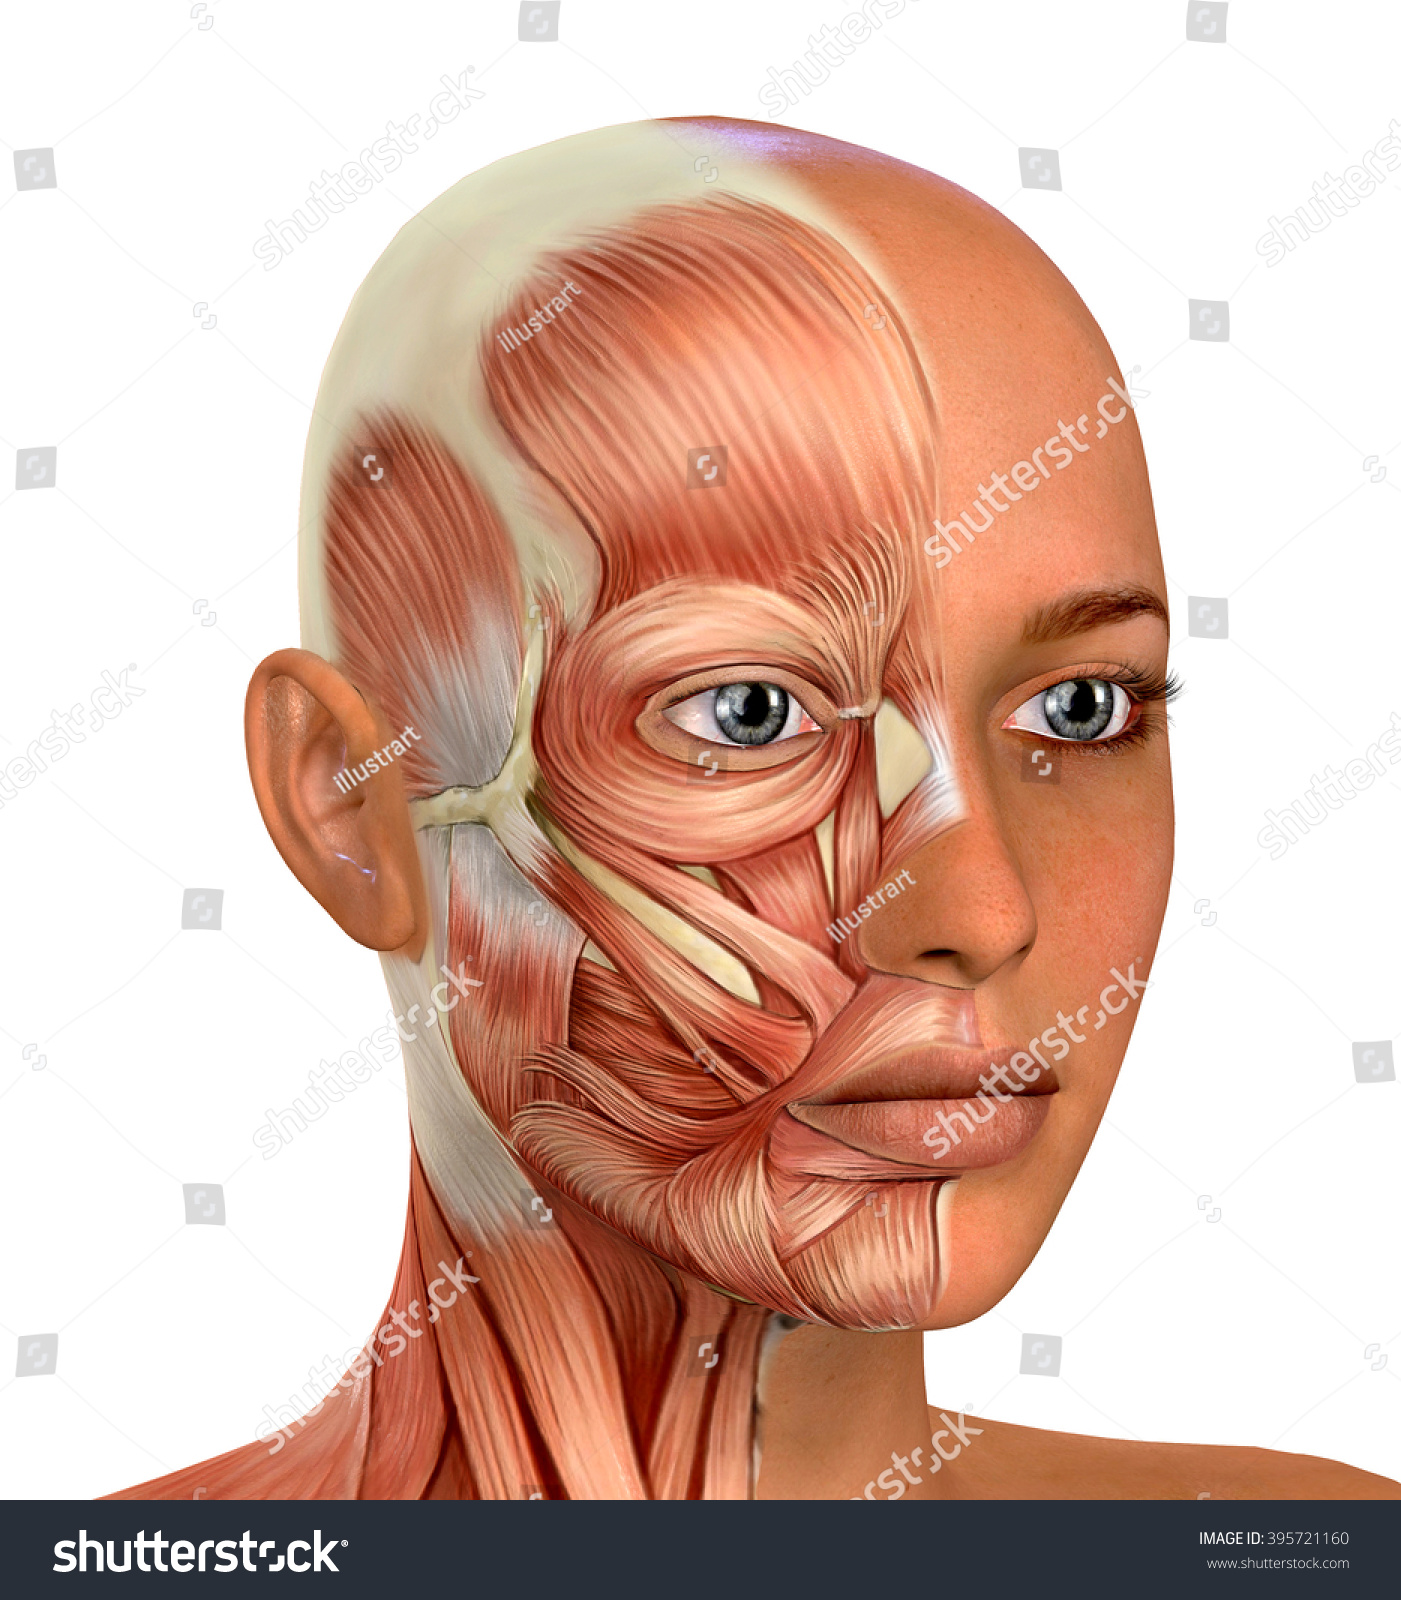 botox facial muscle diagram 2006 honda pilot fuse online image and photo editor shutterstock